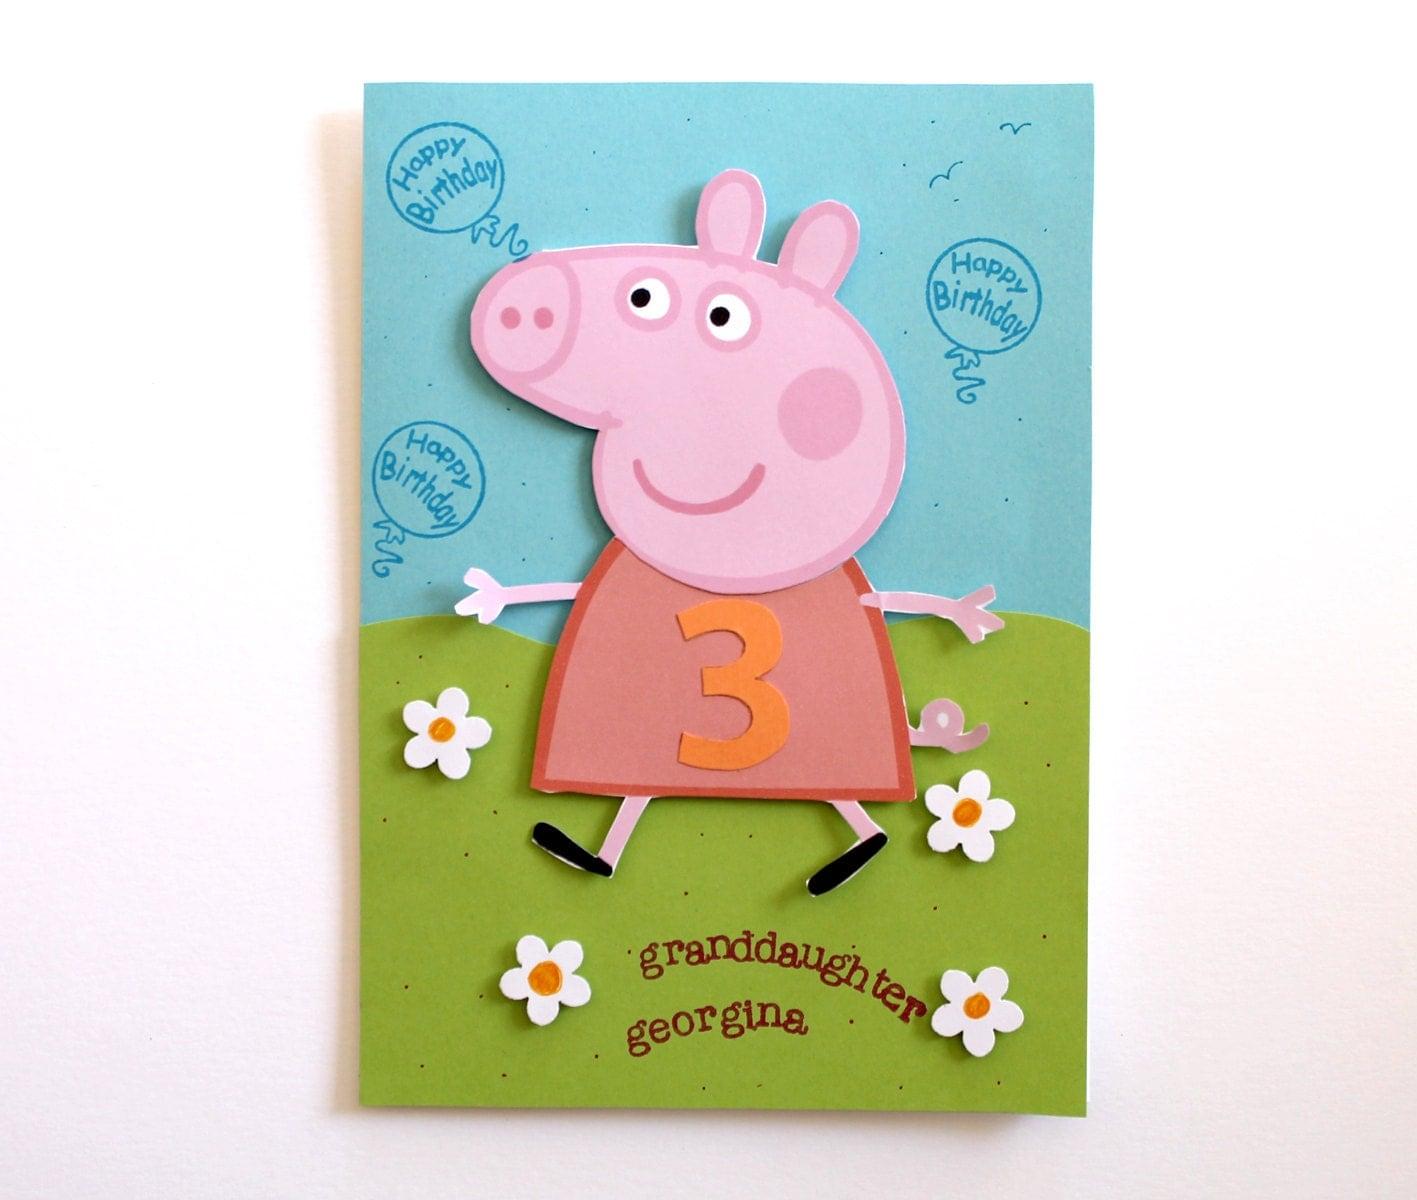 Peppa Pig Birthday Card Personalized for Kids Handmade – Peppa Pig Birthday Card